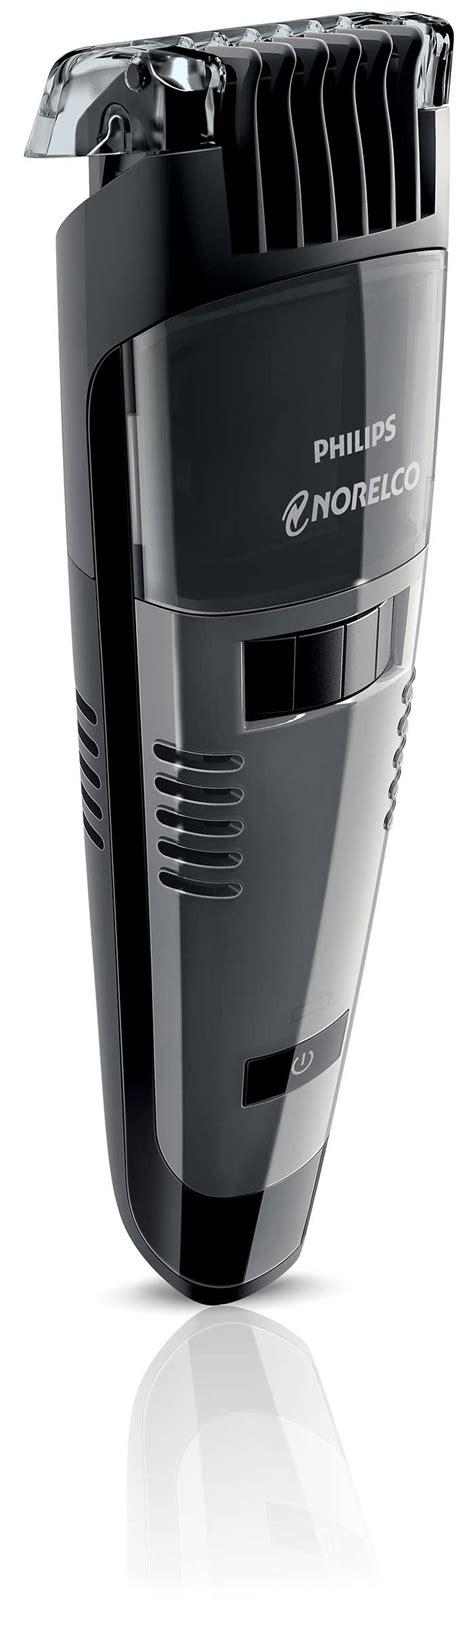 Hair Dryer Junglee philips beard trimmer qt4019 beardtrimmer series 3000 stubble and beard trimmer qt4019 15